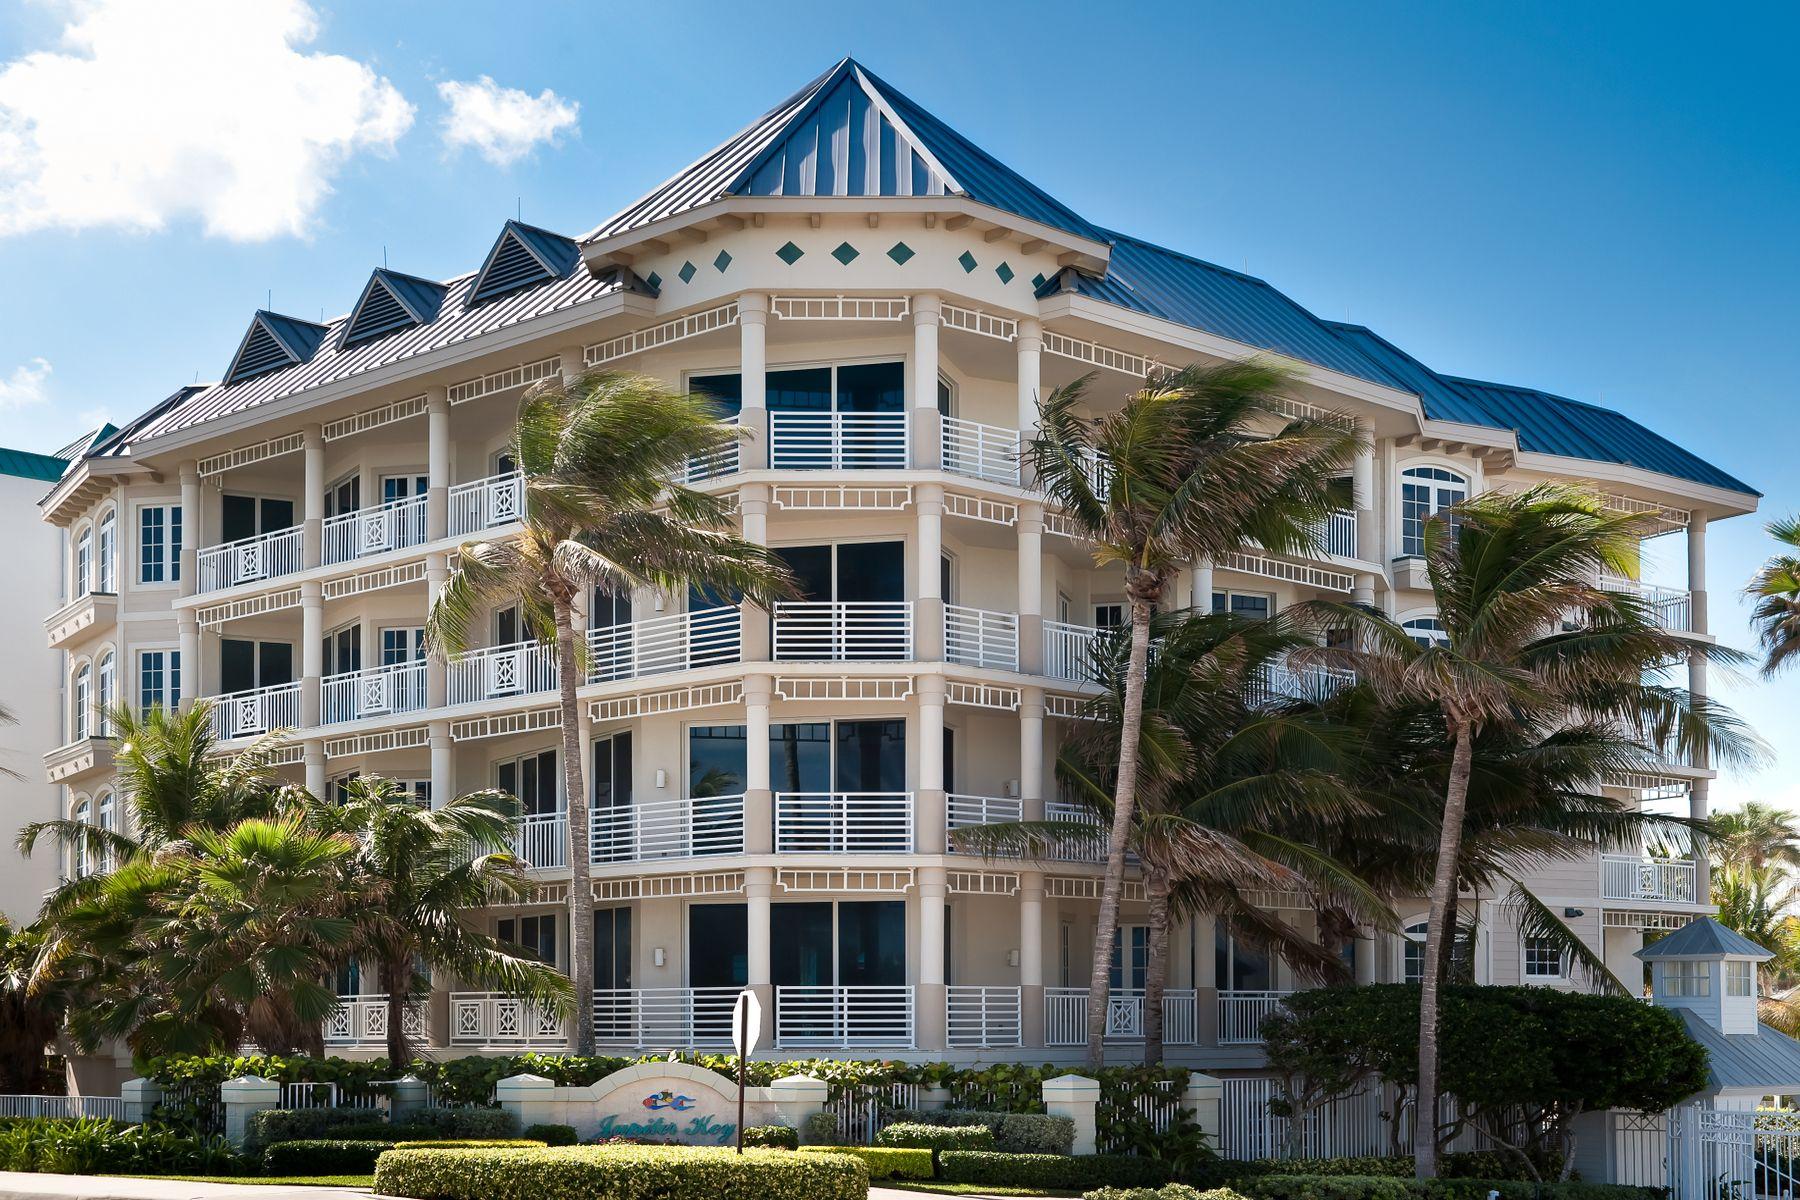 Condominiums for Sale at 120 Jupiter Key Rd Apt 1, Jupiter, Florida 33477 United States